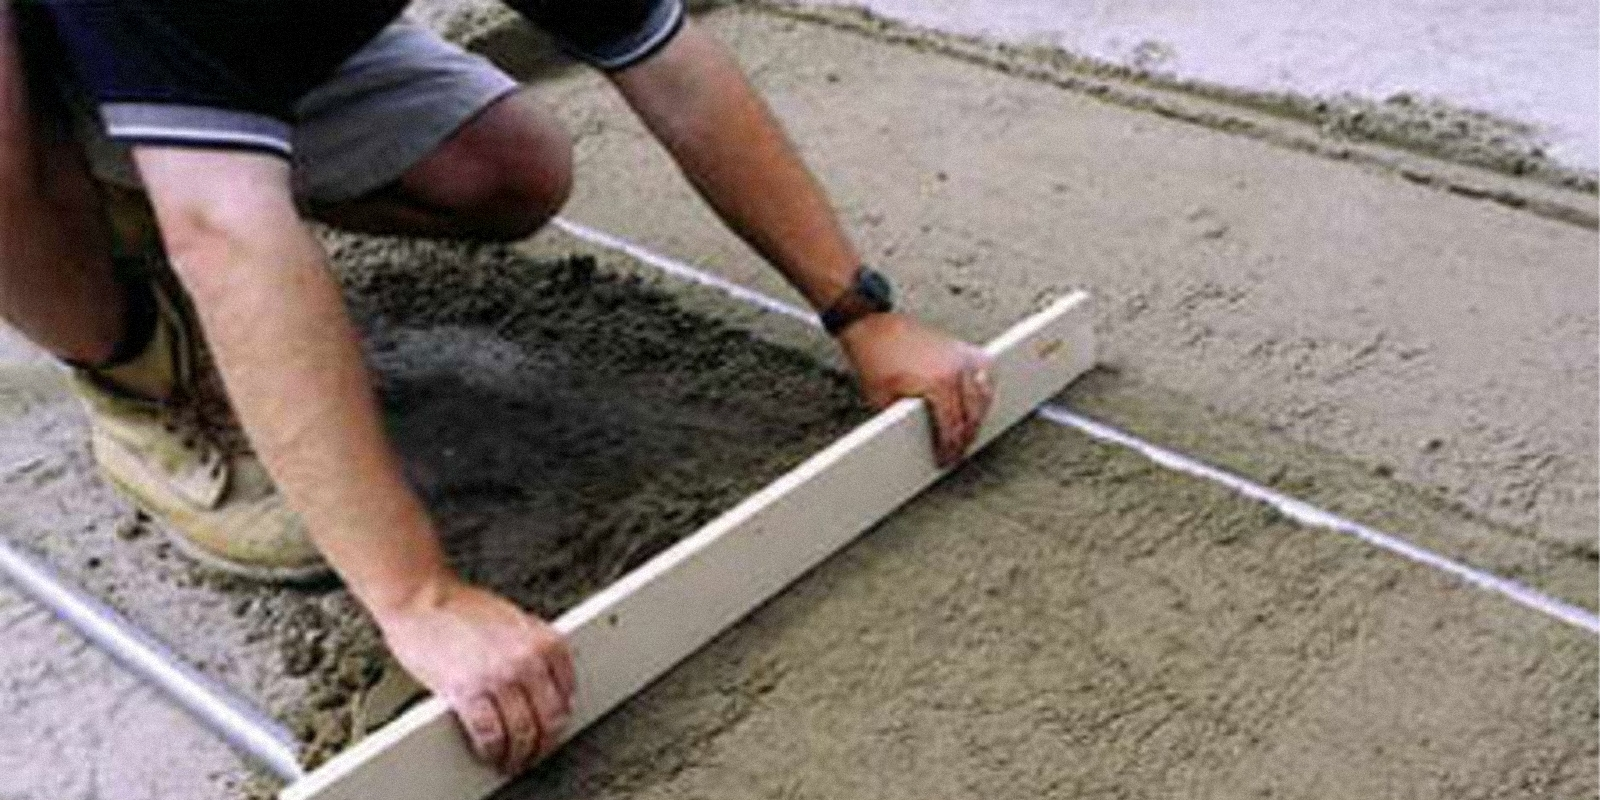 можно ли класть бетон на землю